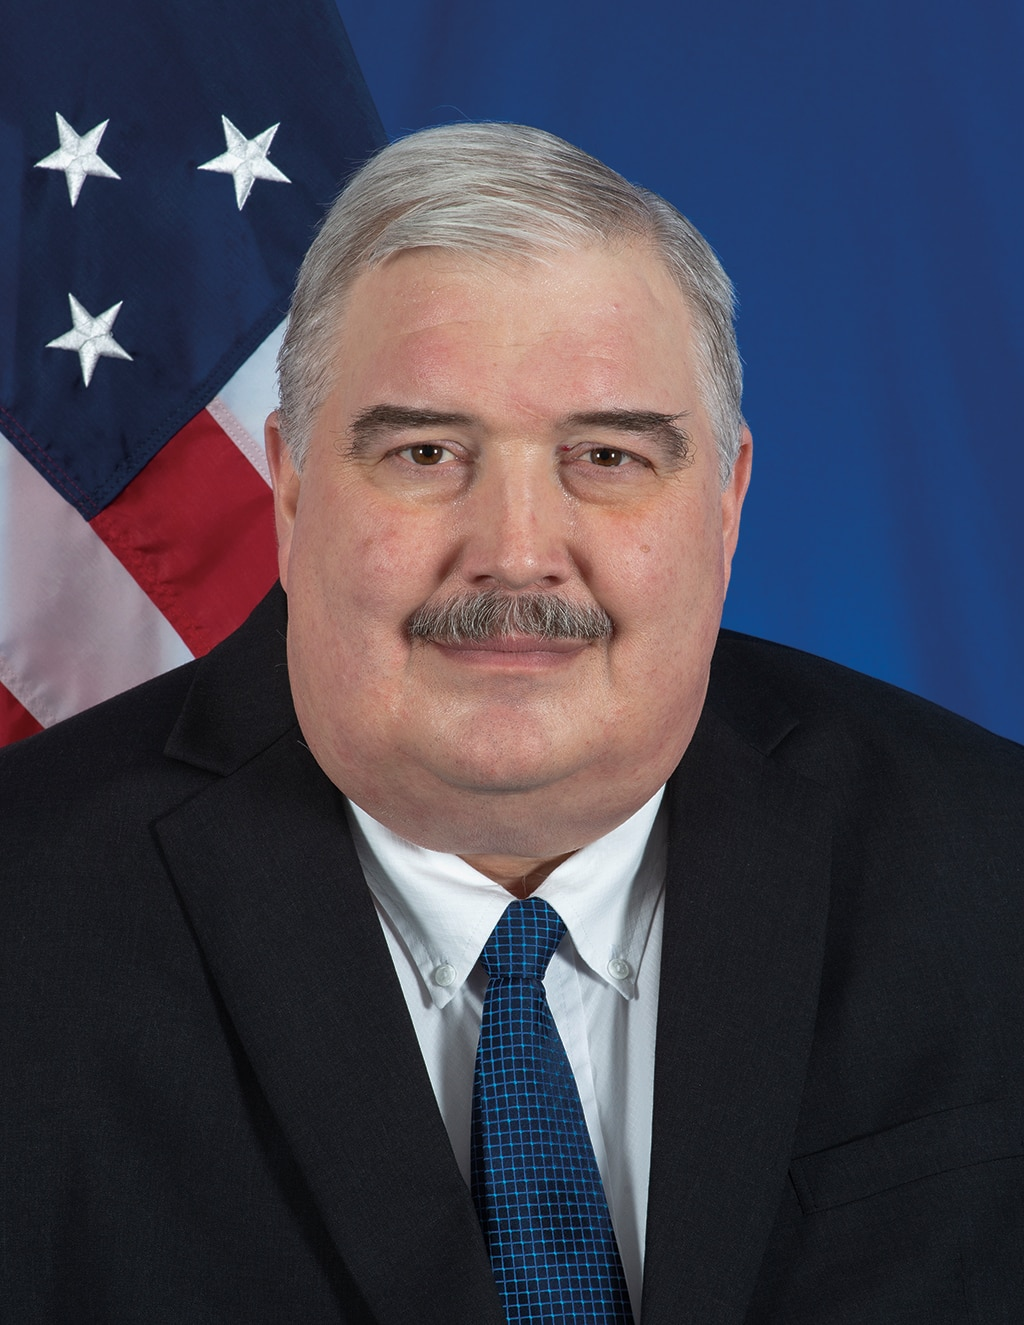 Photo showing Jeffrey C. Mounts, Comptroller.